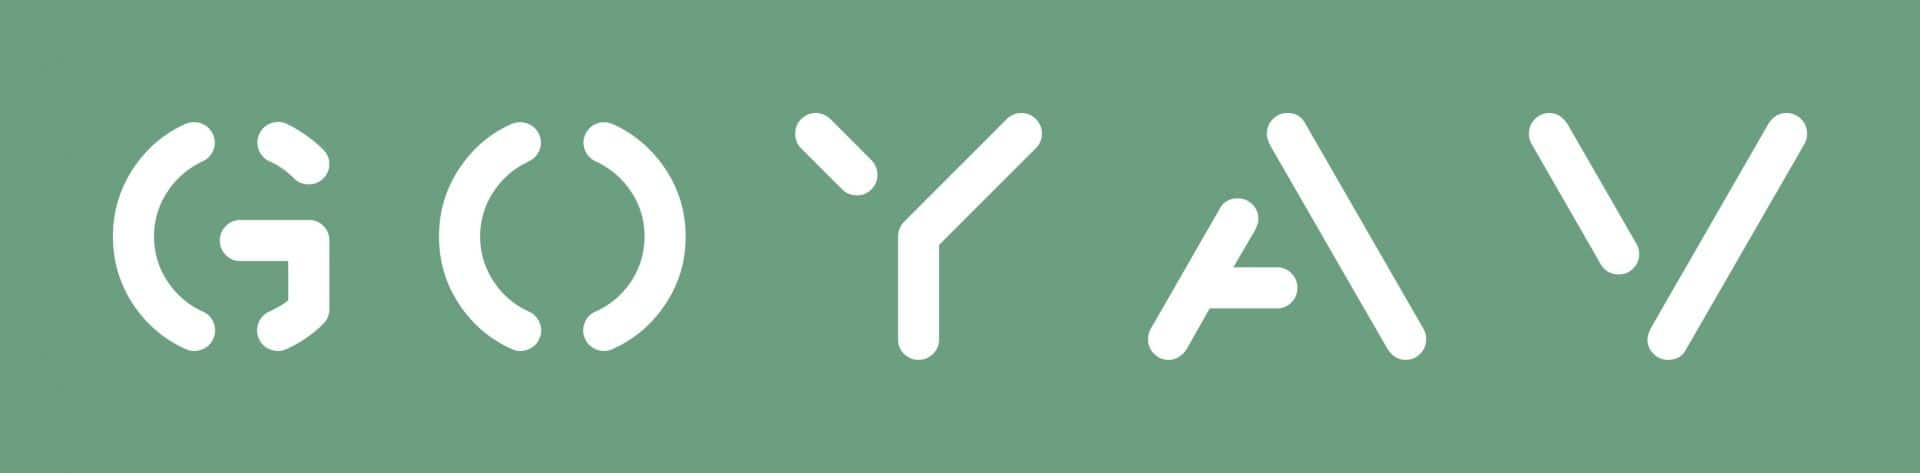 goyav-white_logo_color_background